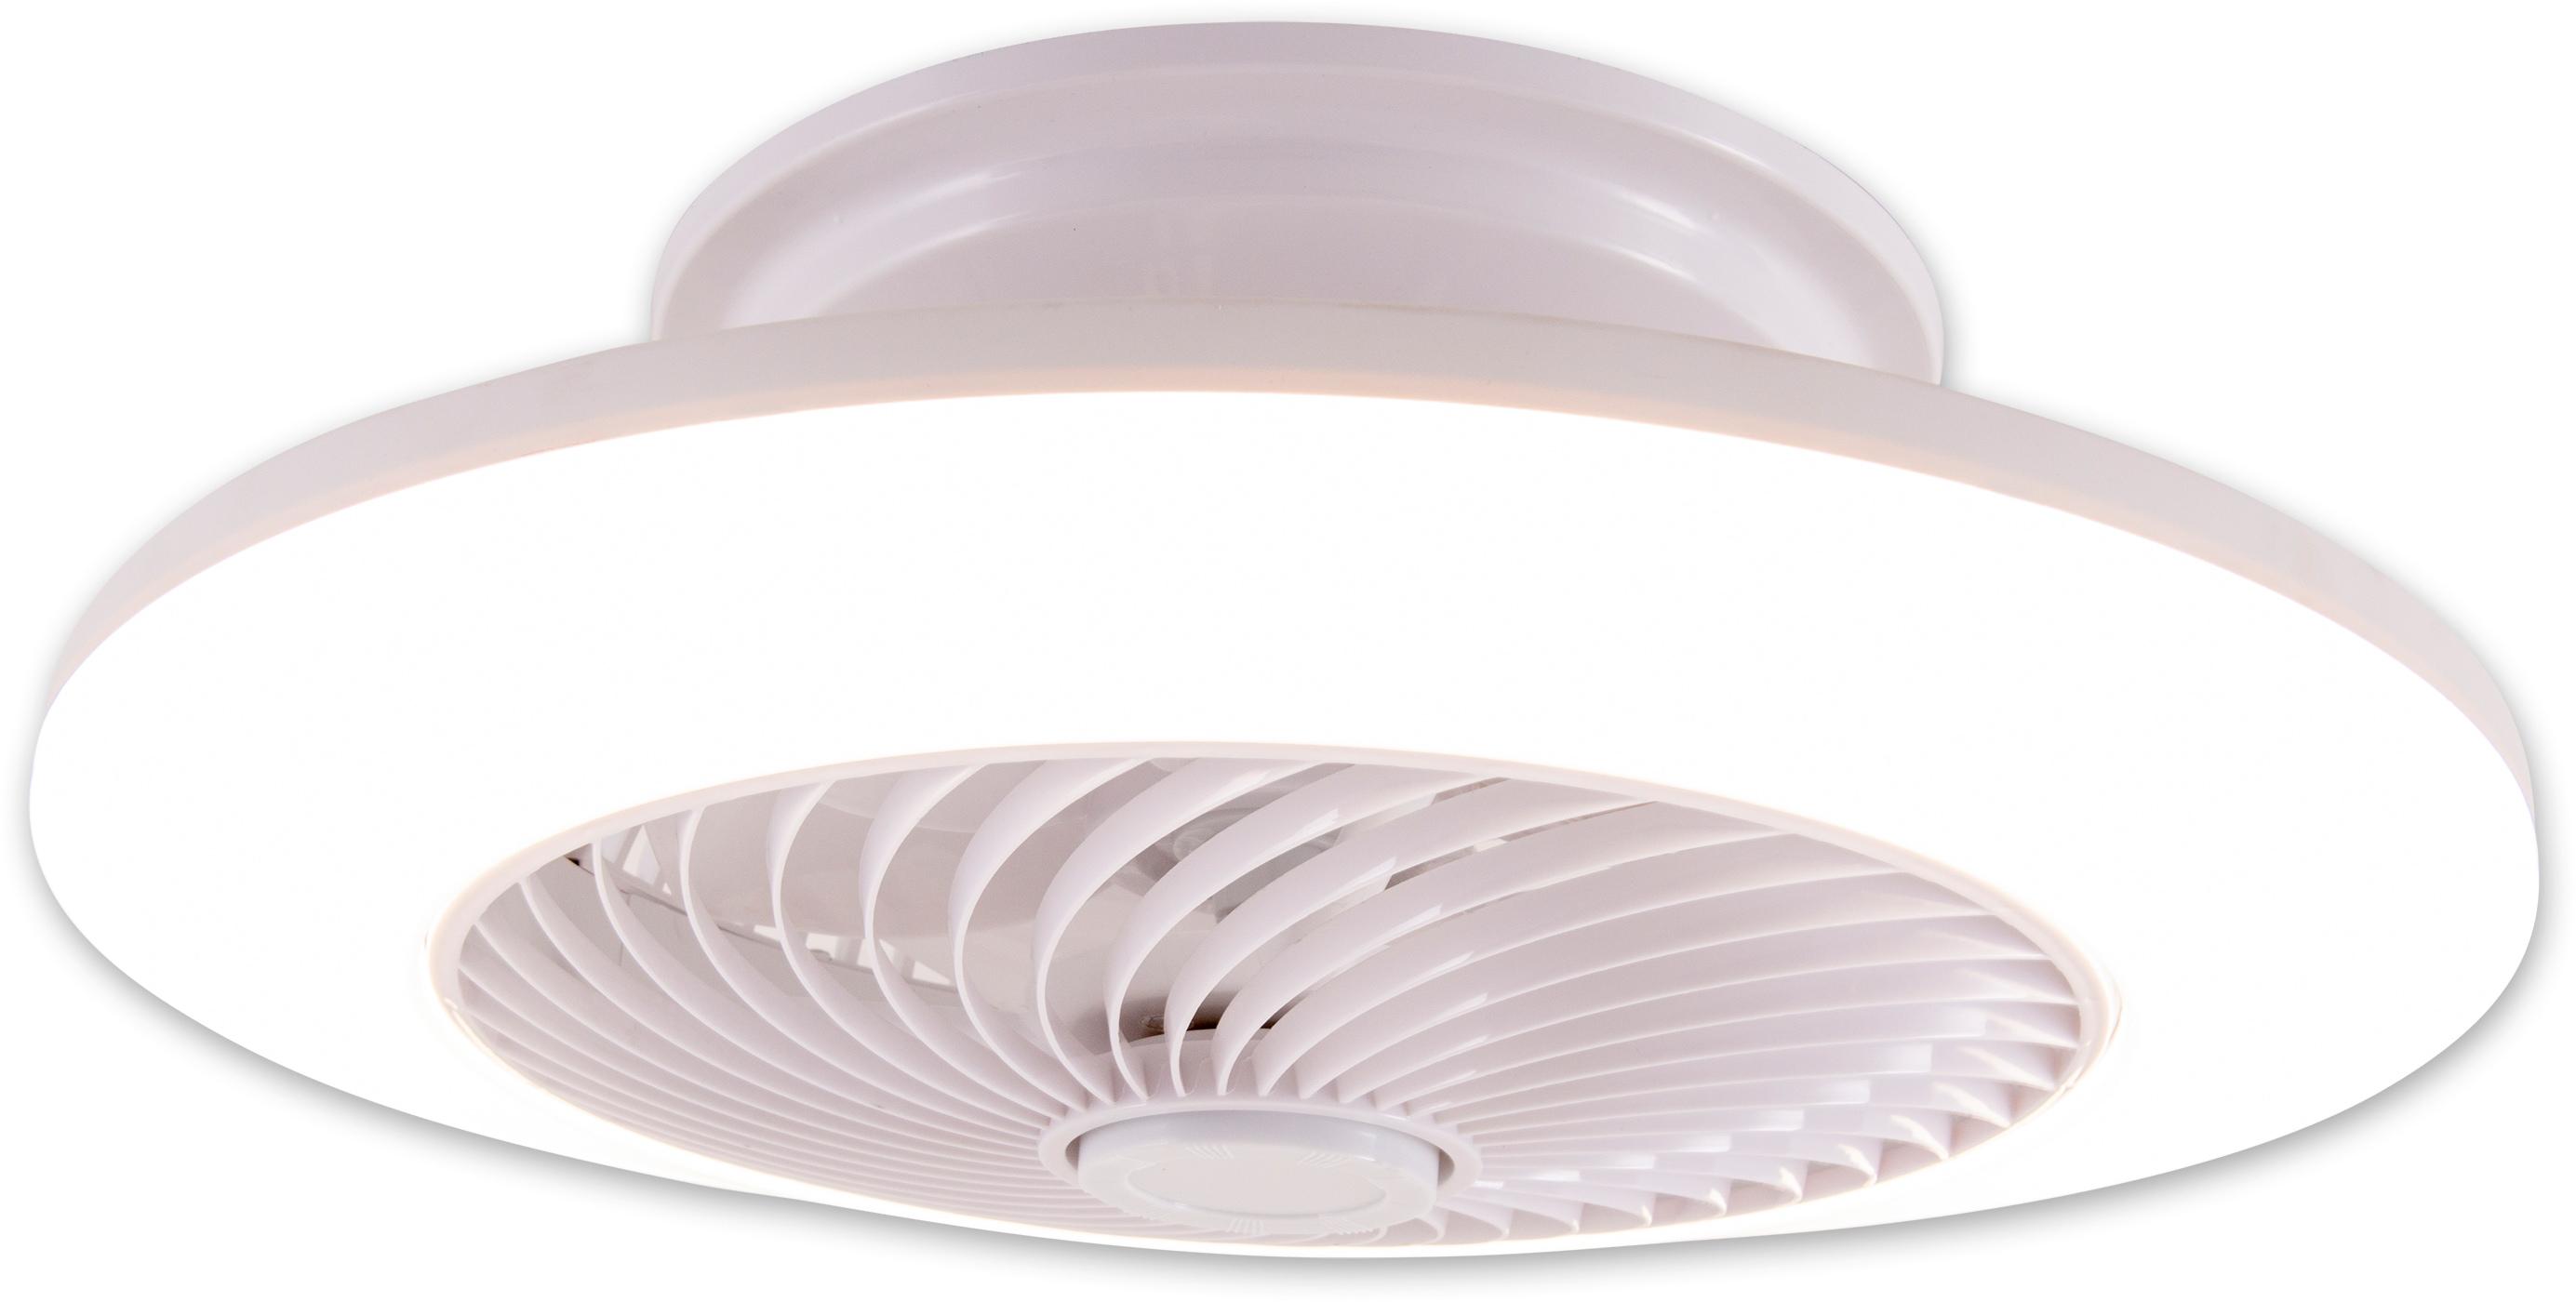 näve,LED Deckenleuchte Adoranto